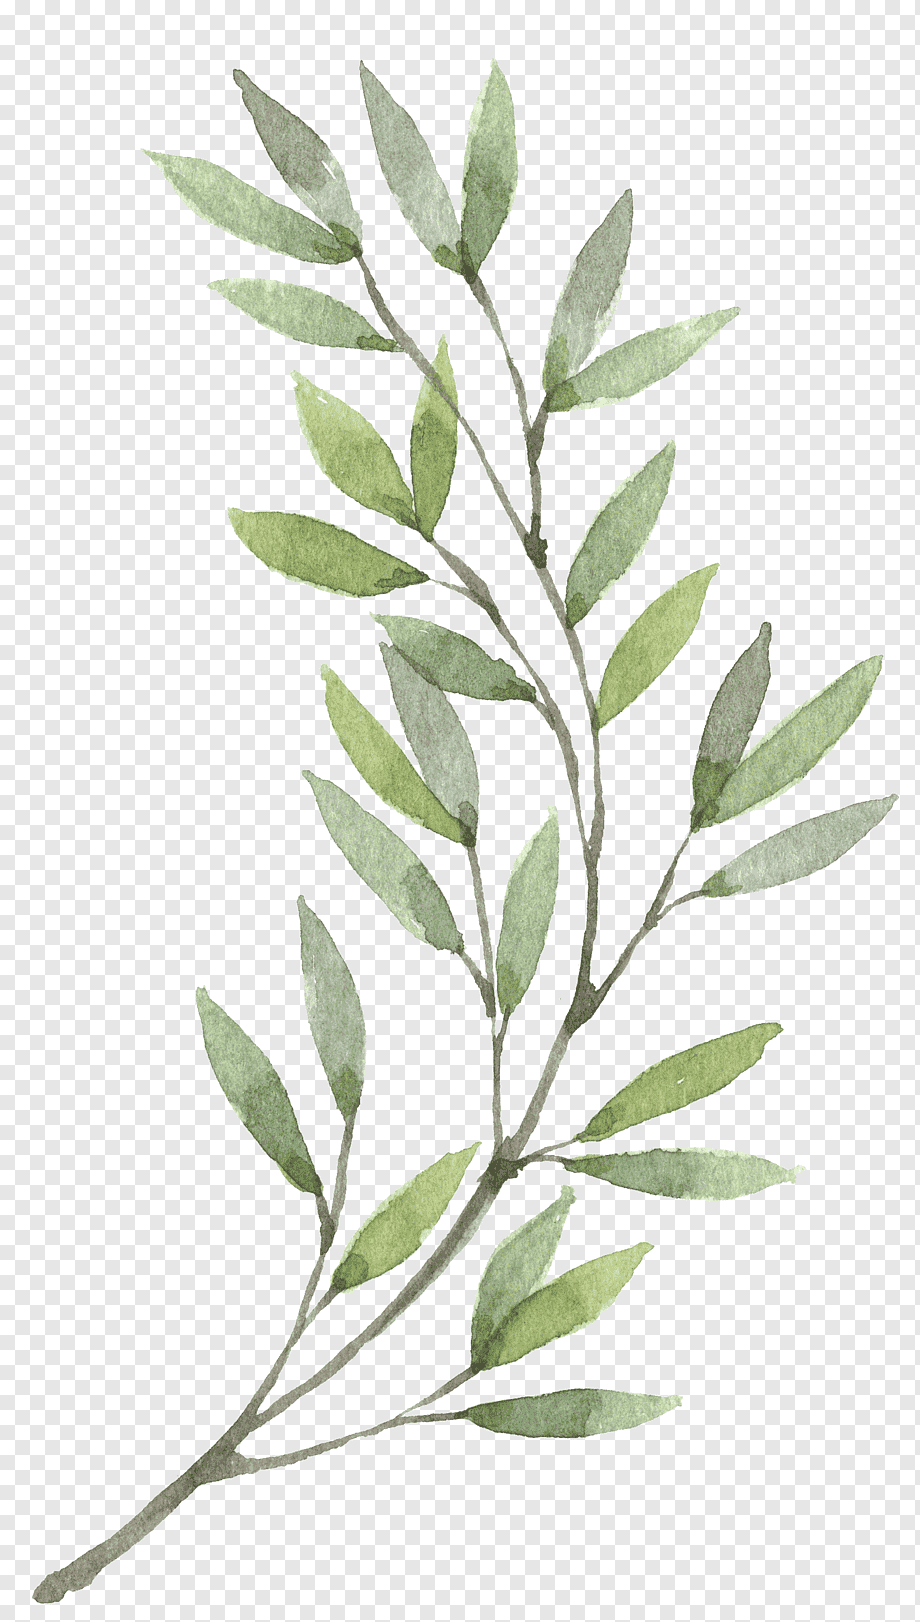 Wreath Watercolor Painting Flower Hand Painted Plants Green Leaves Painting Painted Leaf Branch Png Lukisan Bunga Lukisan Cat Air Ilustrasi Daun